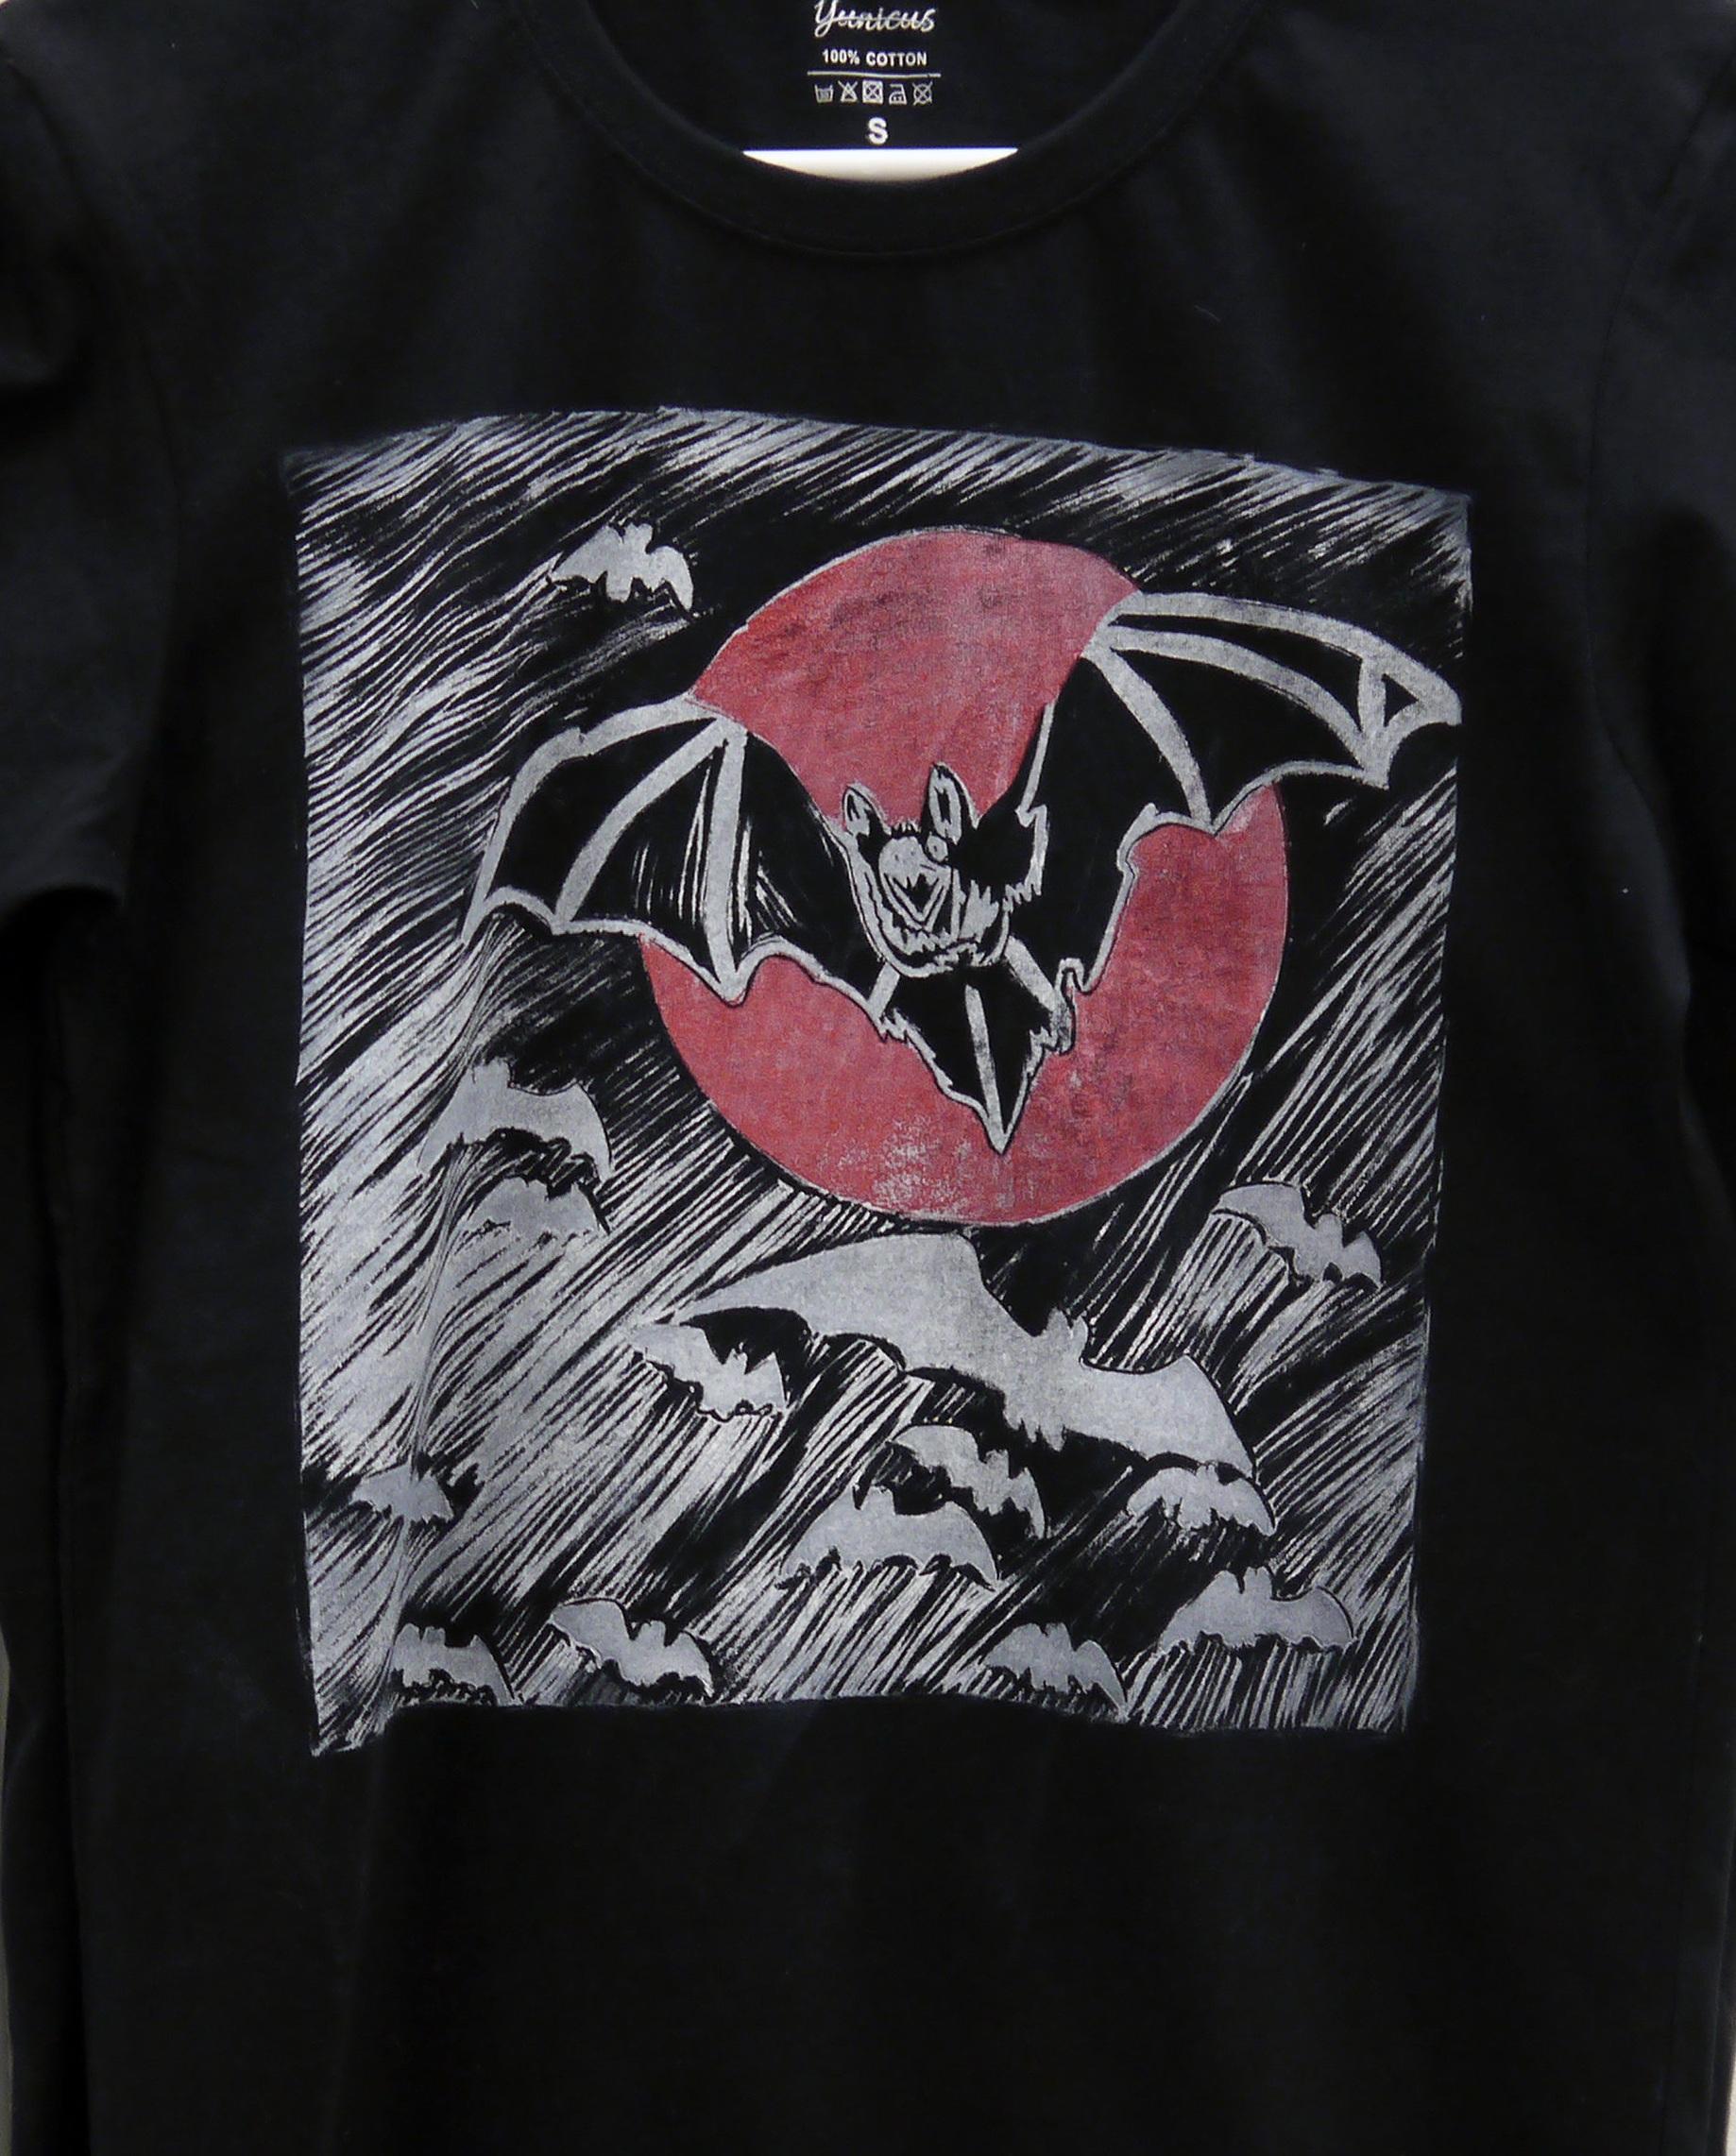 %28SOLD%29+Bats+in+flight+%28t-shirt%29+-+linocut+print+on+t-shirt+-+2018.jpg